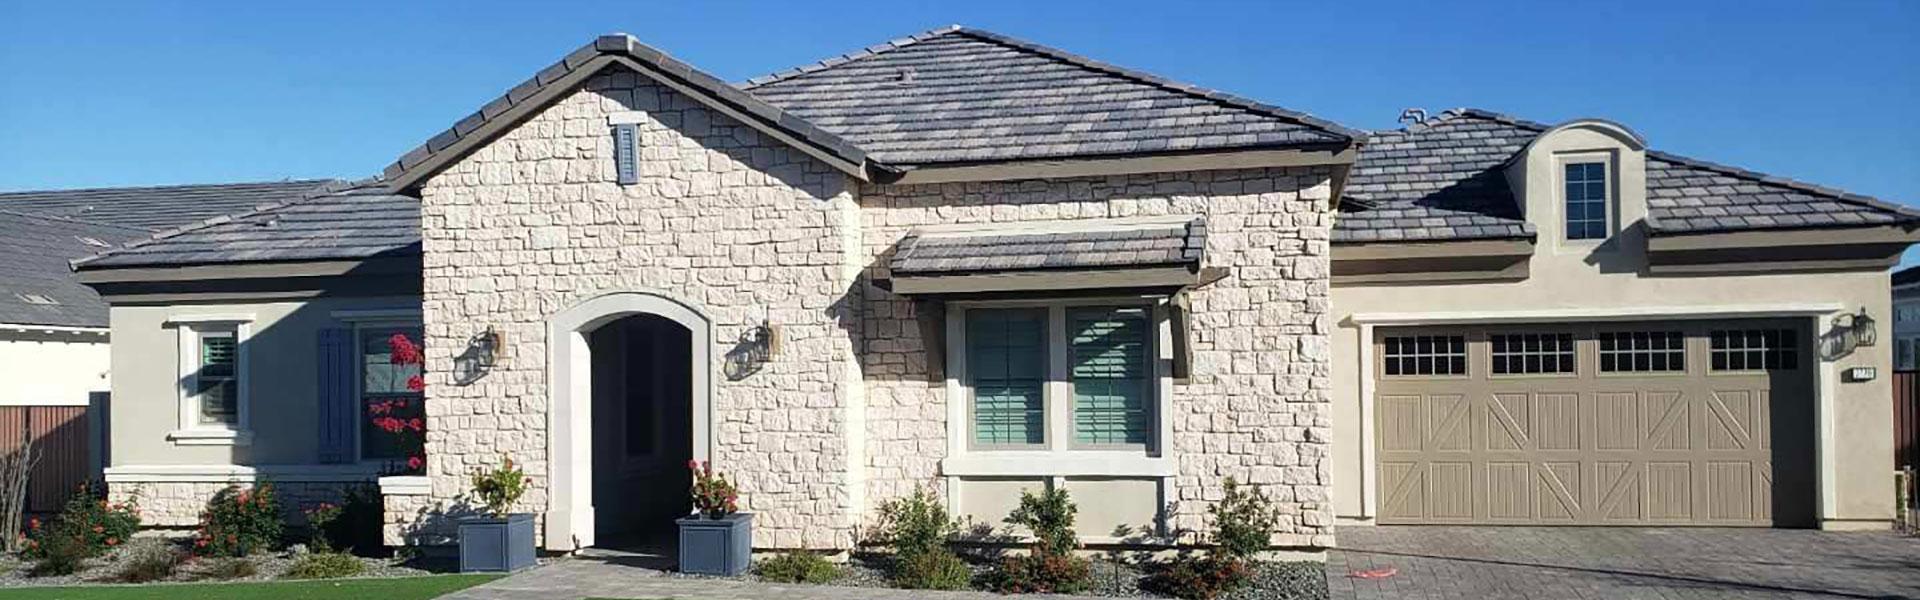 StoneCrafters in Phoenix, Arizona: Stone Veneer Rough Cut - Casa Blanca